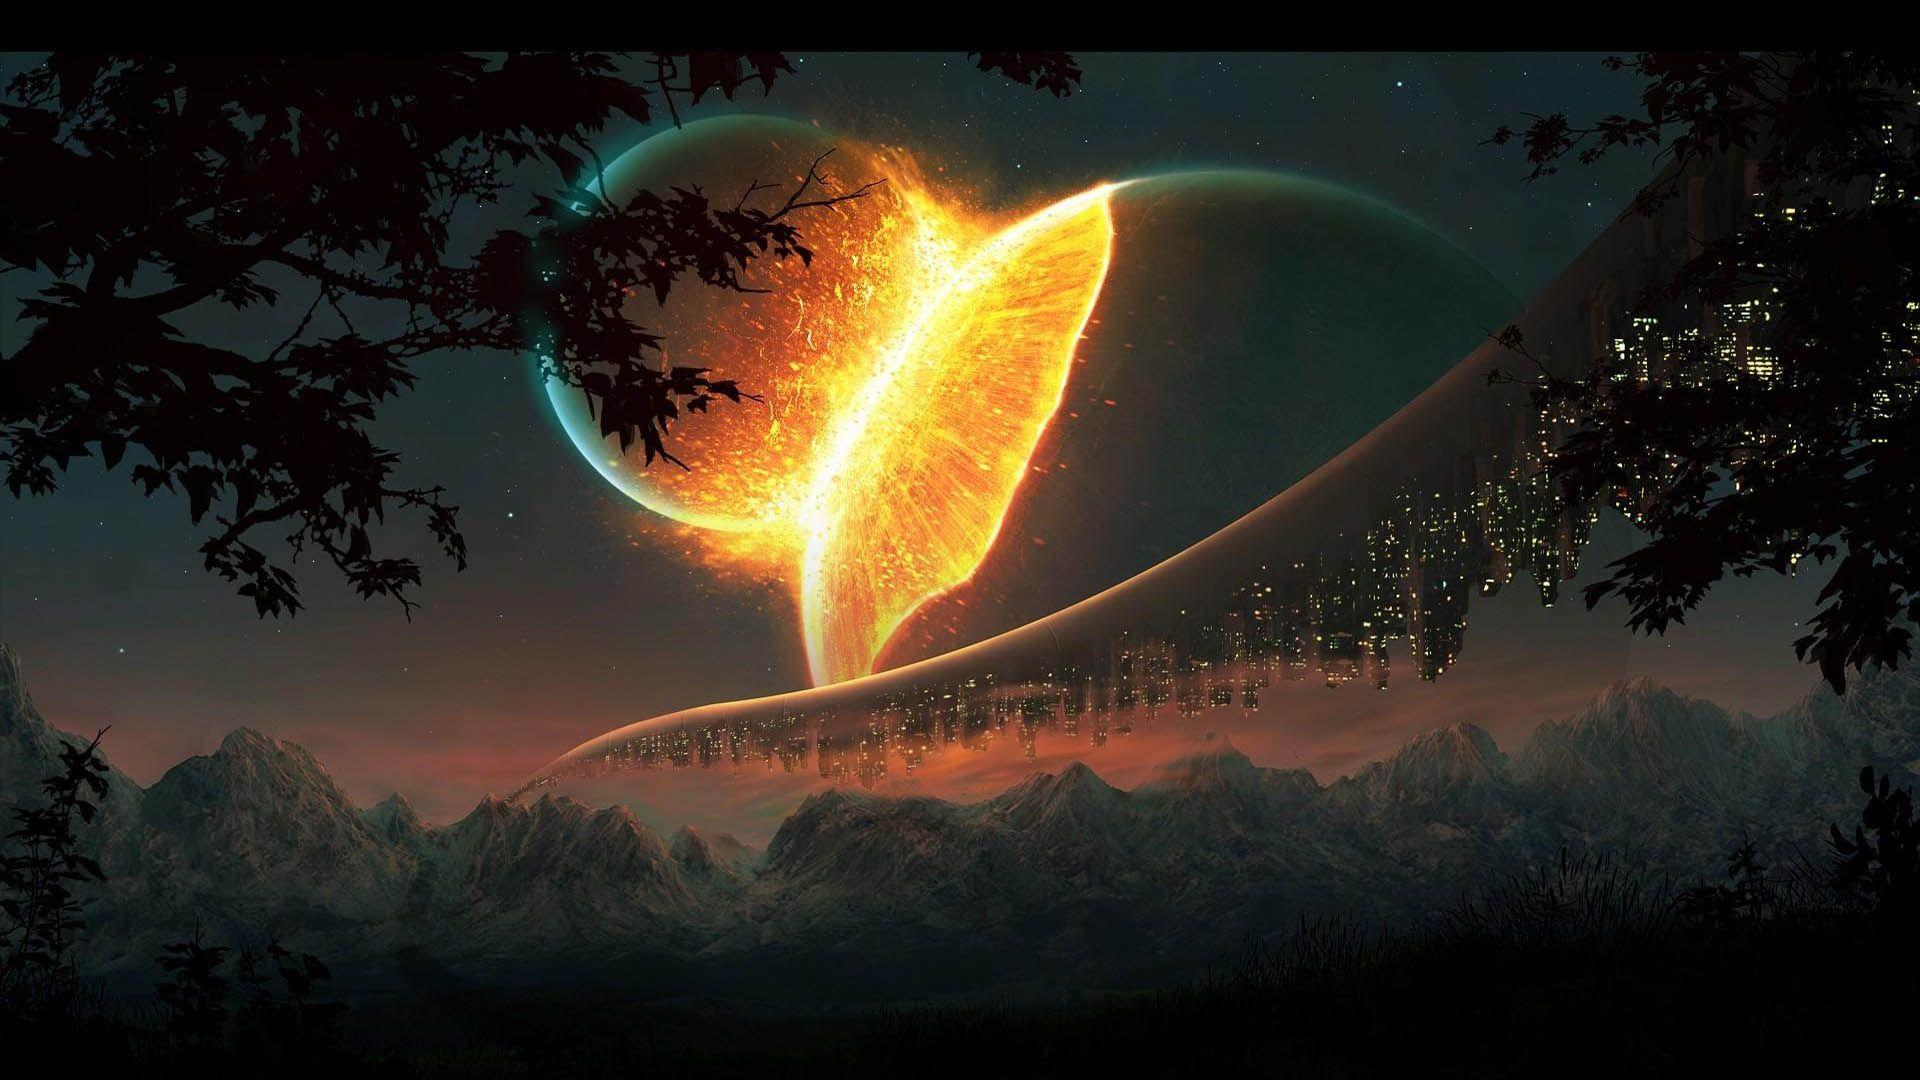 Fantasy sfondi desktop hd fantasy spazio mondi for Sfondi spazio hd